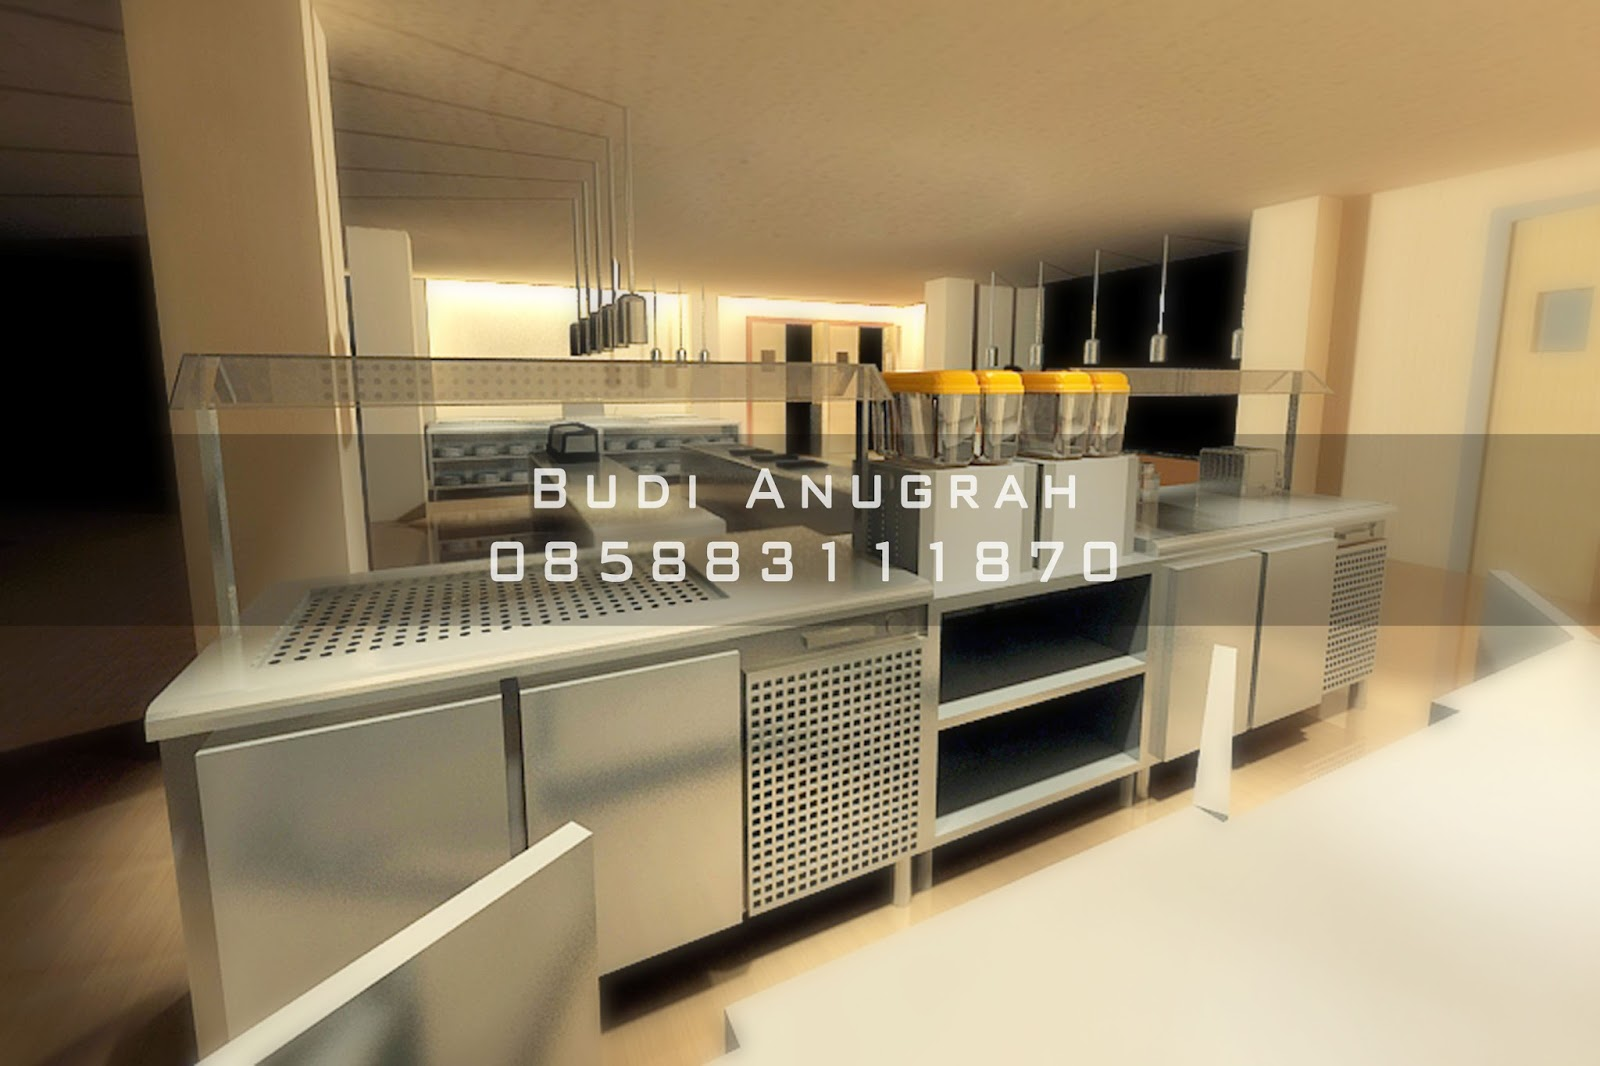 Jual peralatan kitchen equipment stainlees steel restorant hotel se indonesia